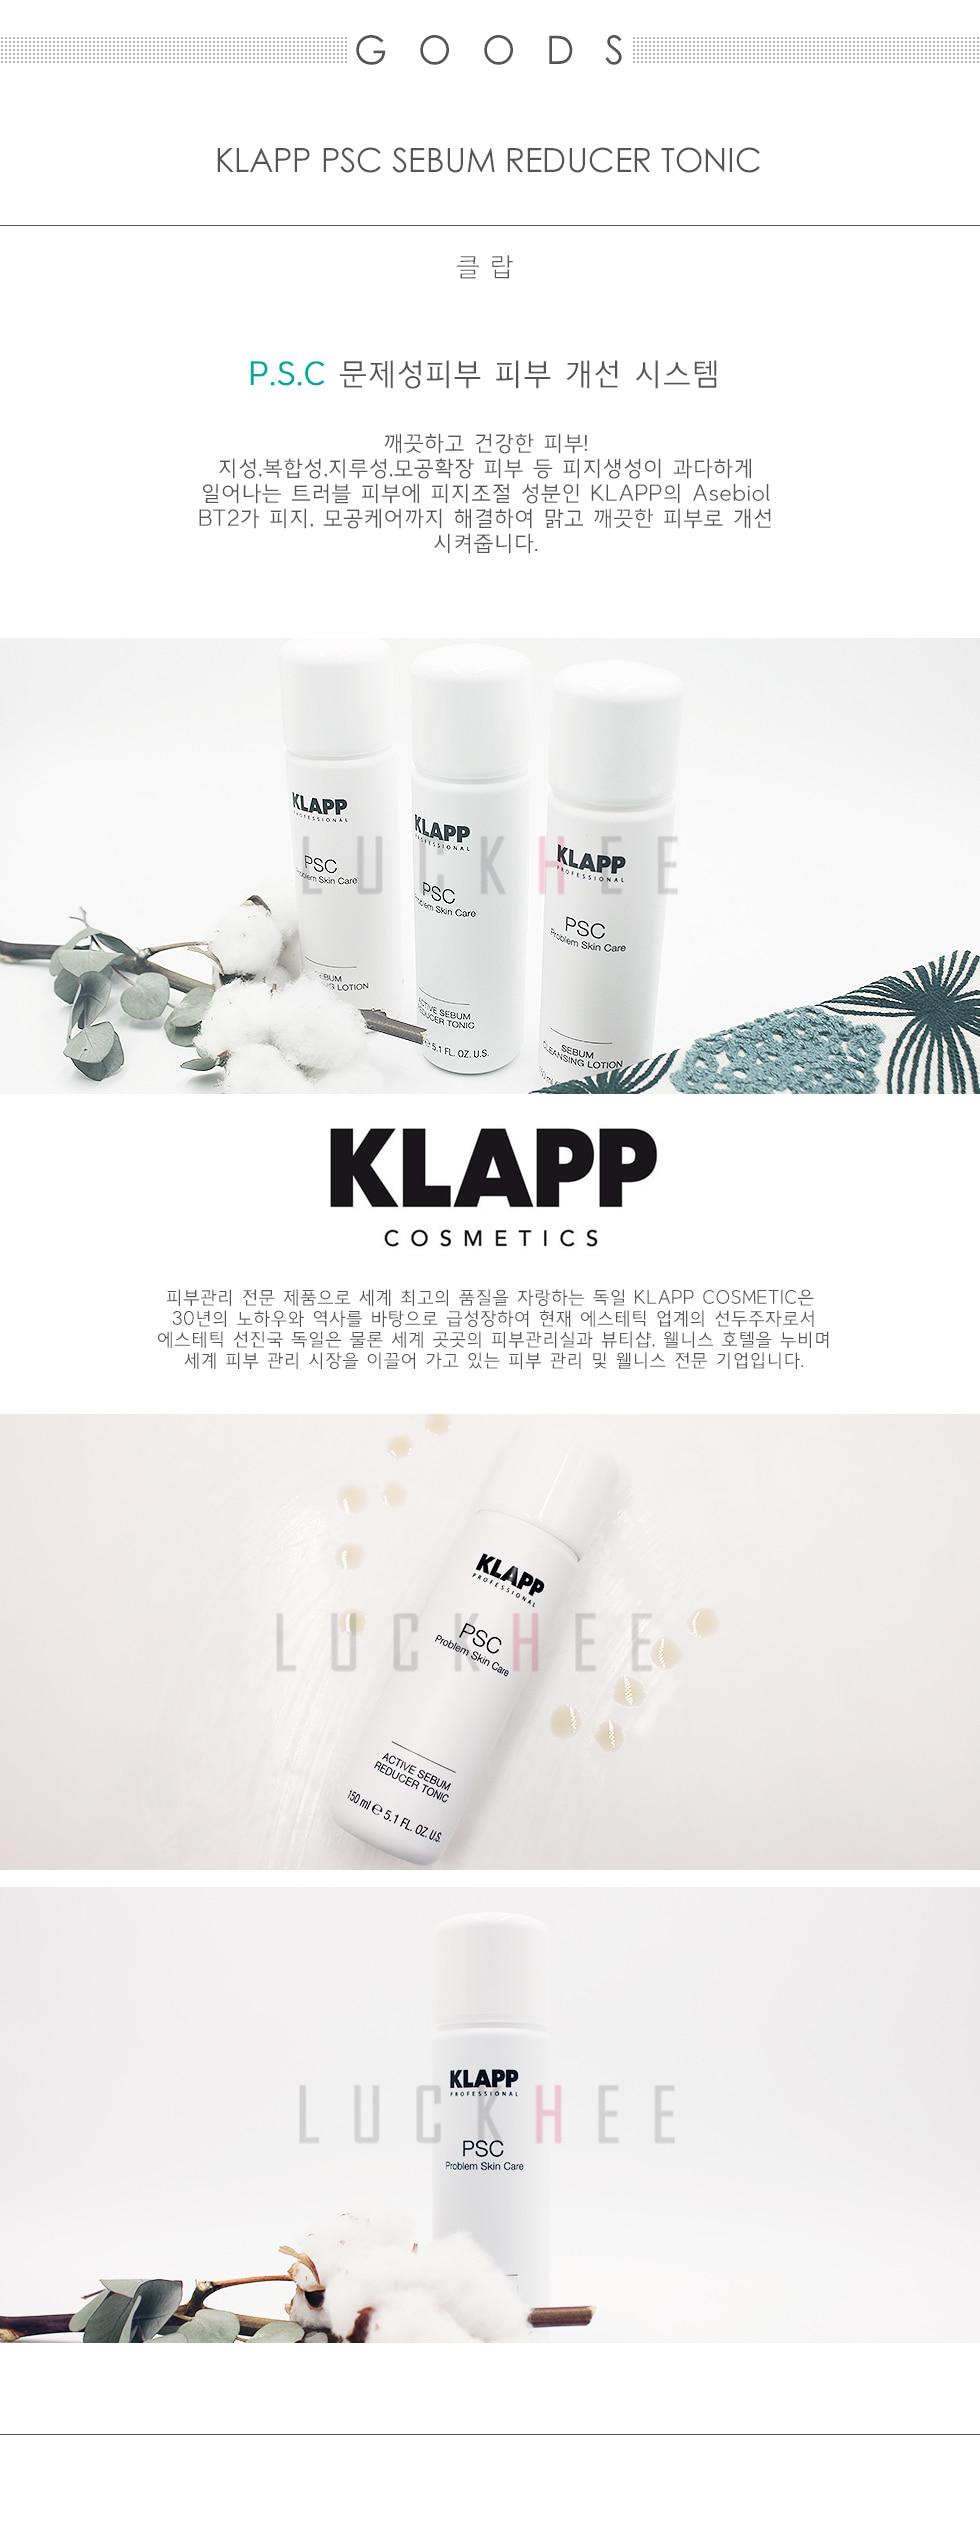 klapp psc problem skin care